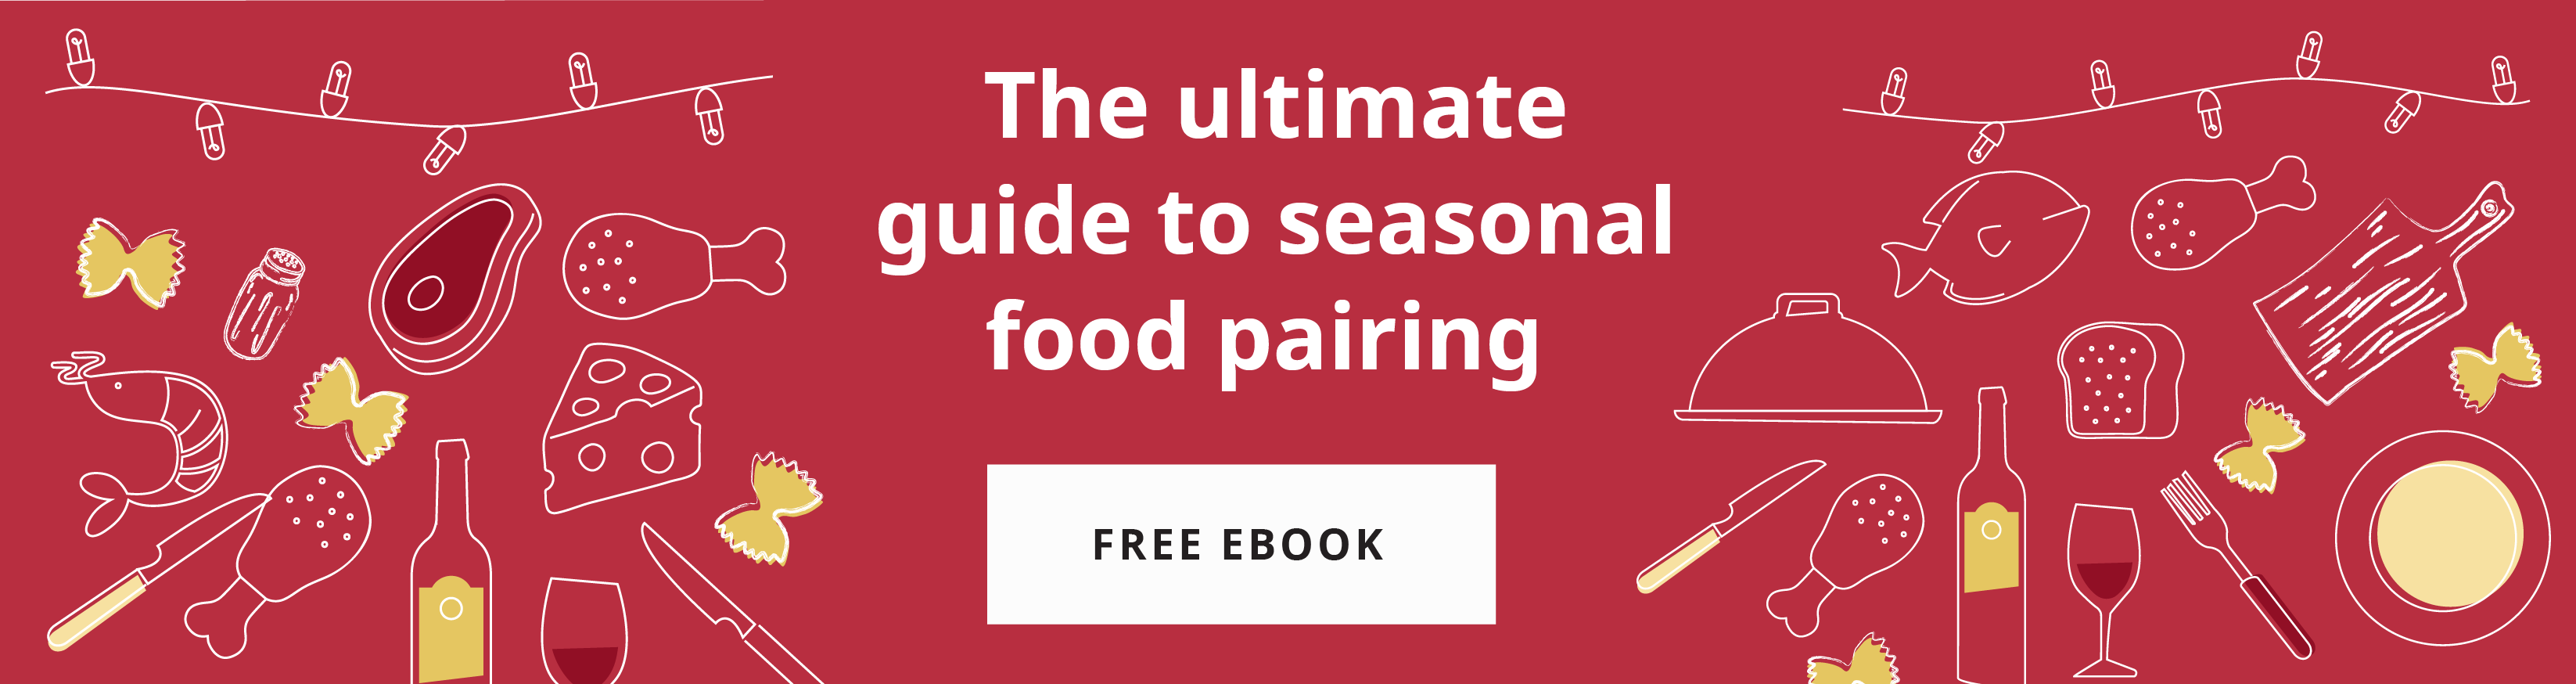 Seasonal-food-pairing-guide